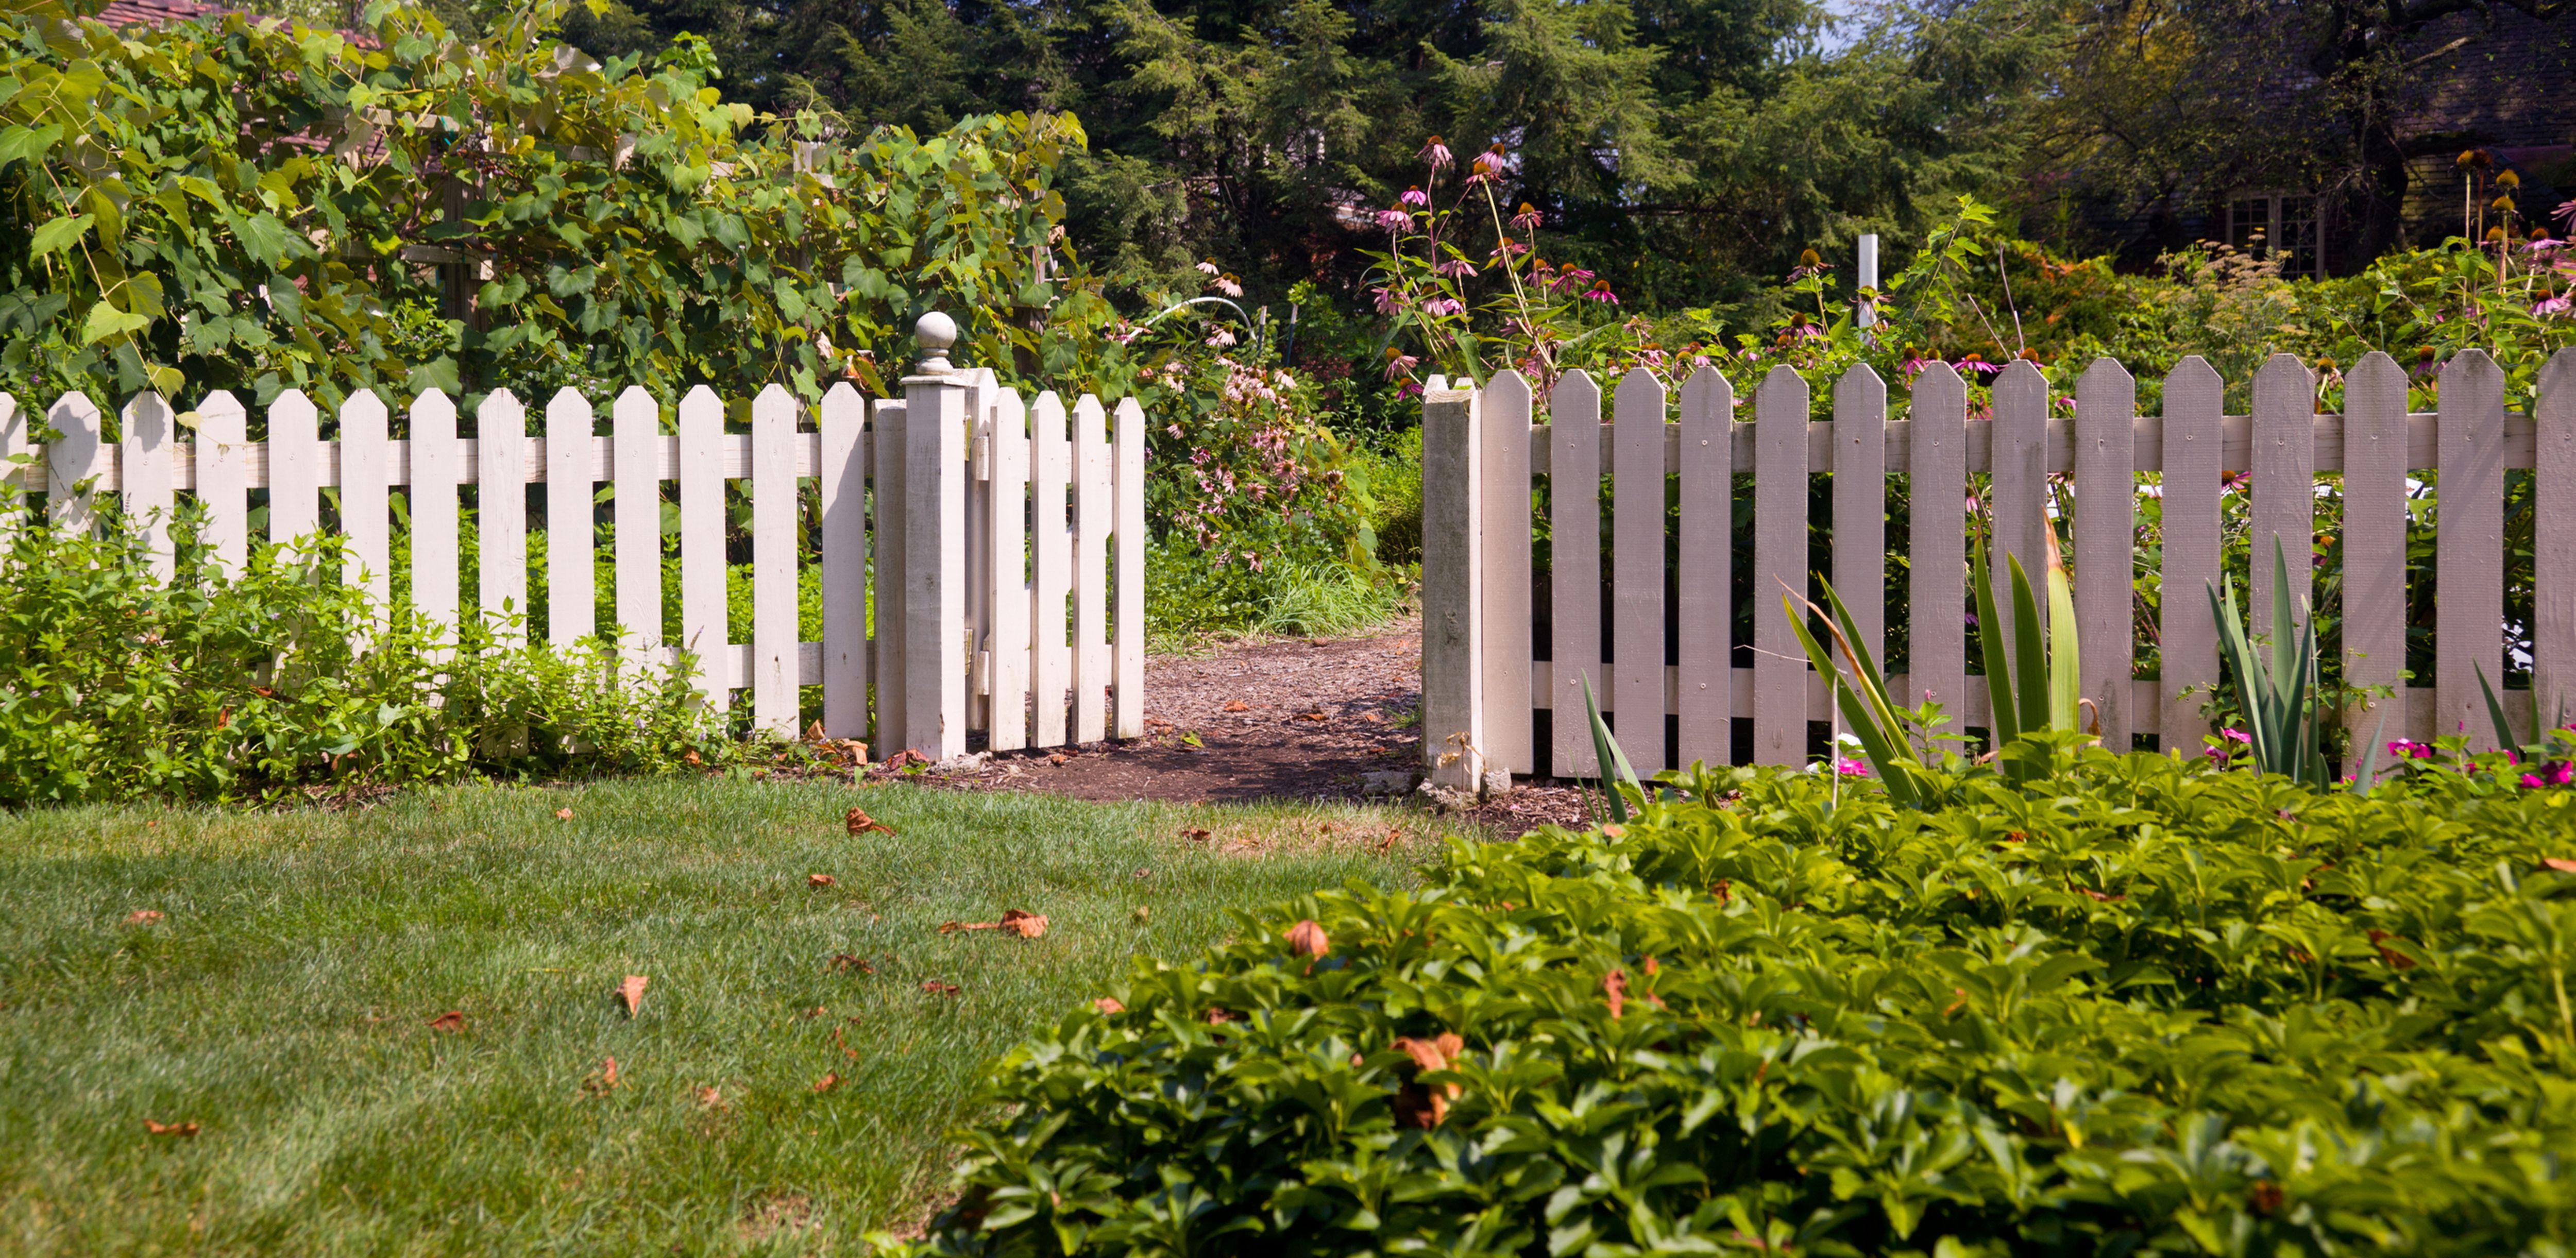 Fence Amp Railing Buying Guide Help Amp Ideas Diy At B Amp Q